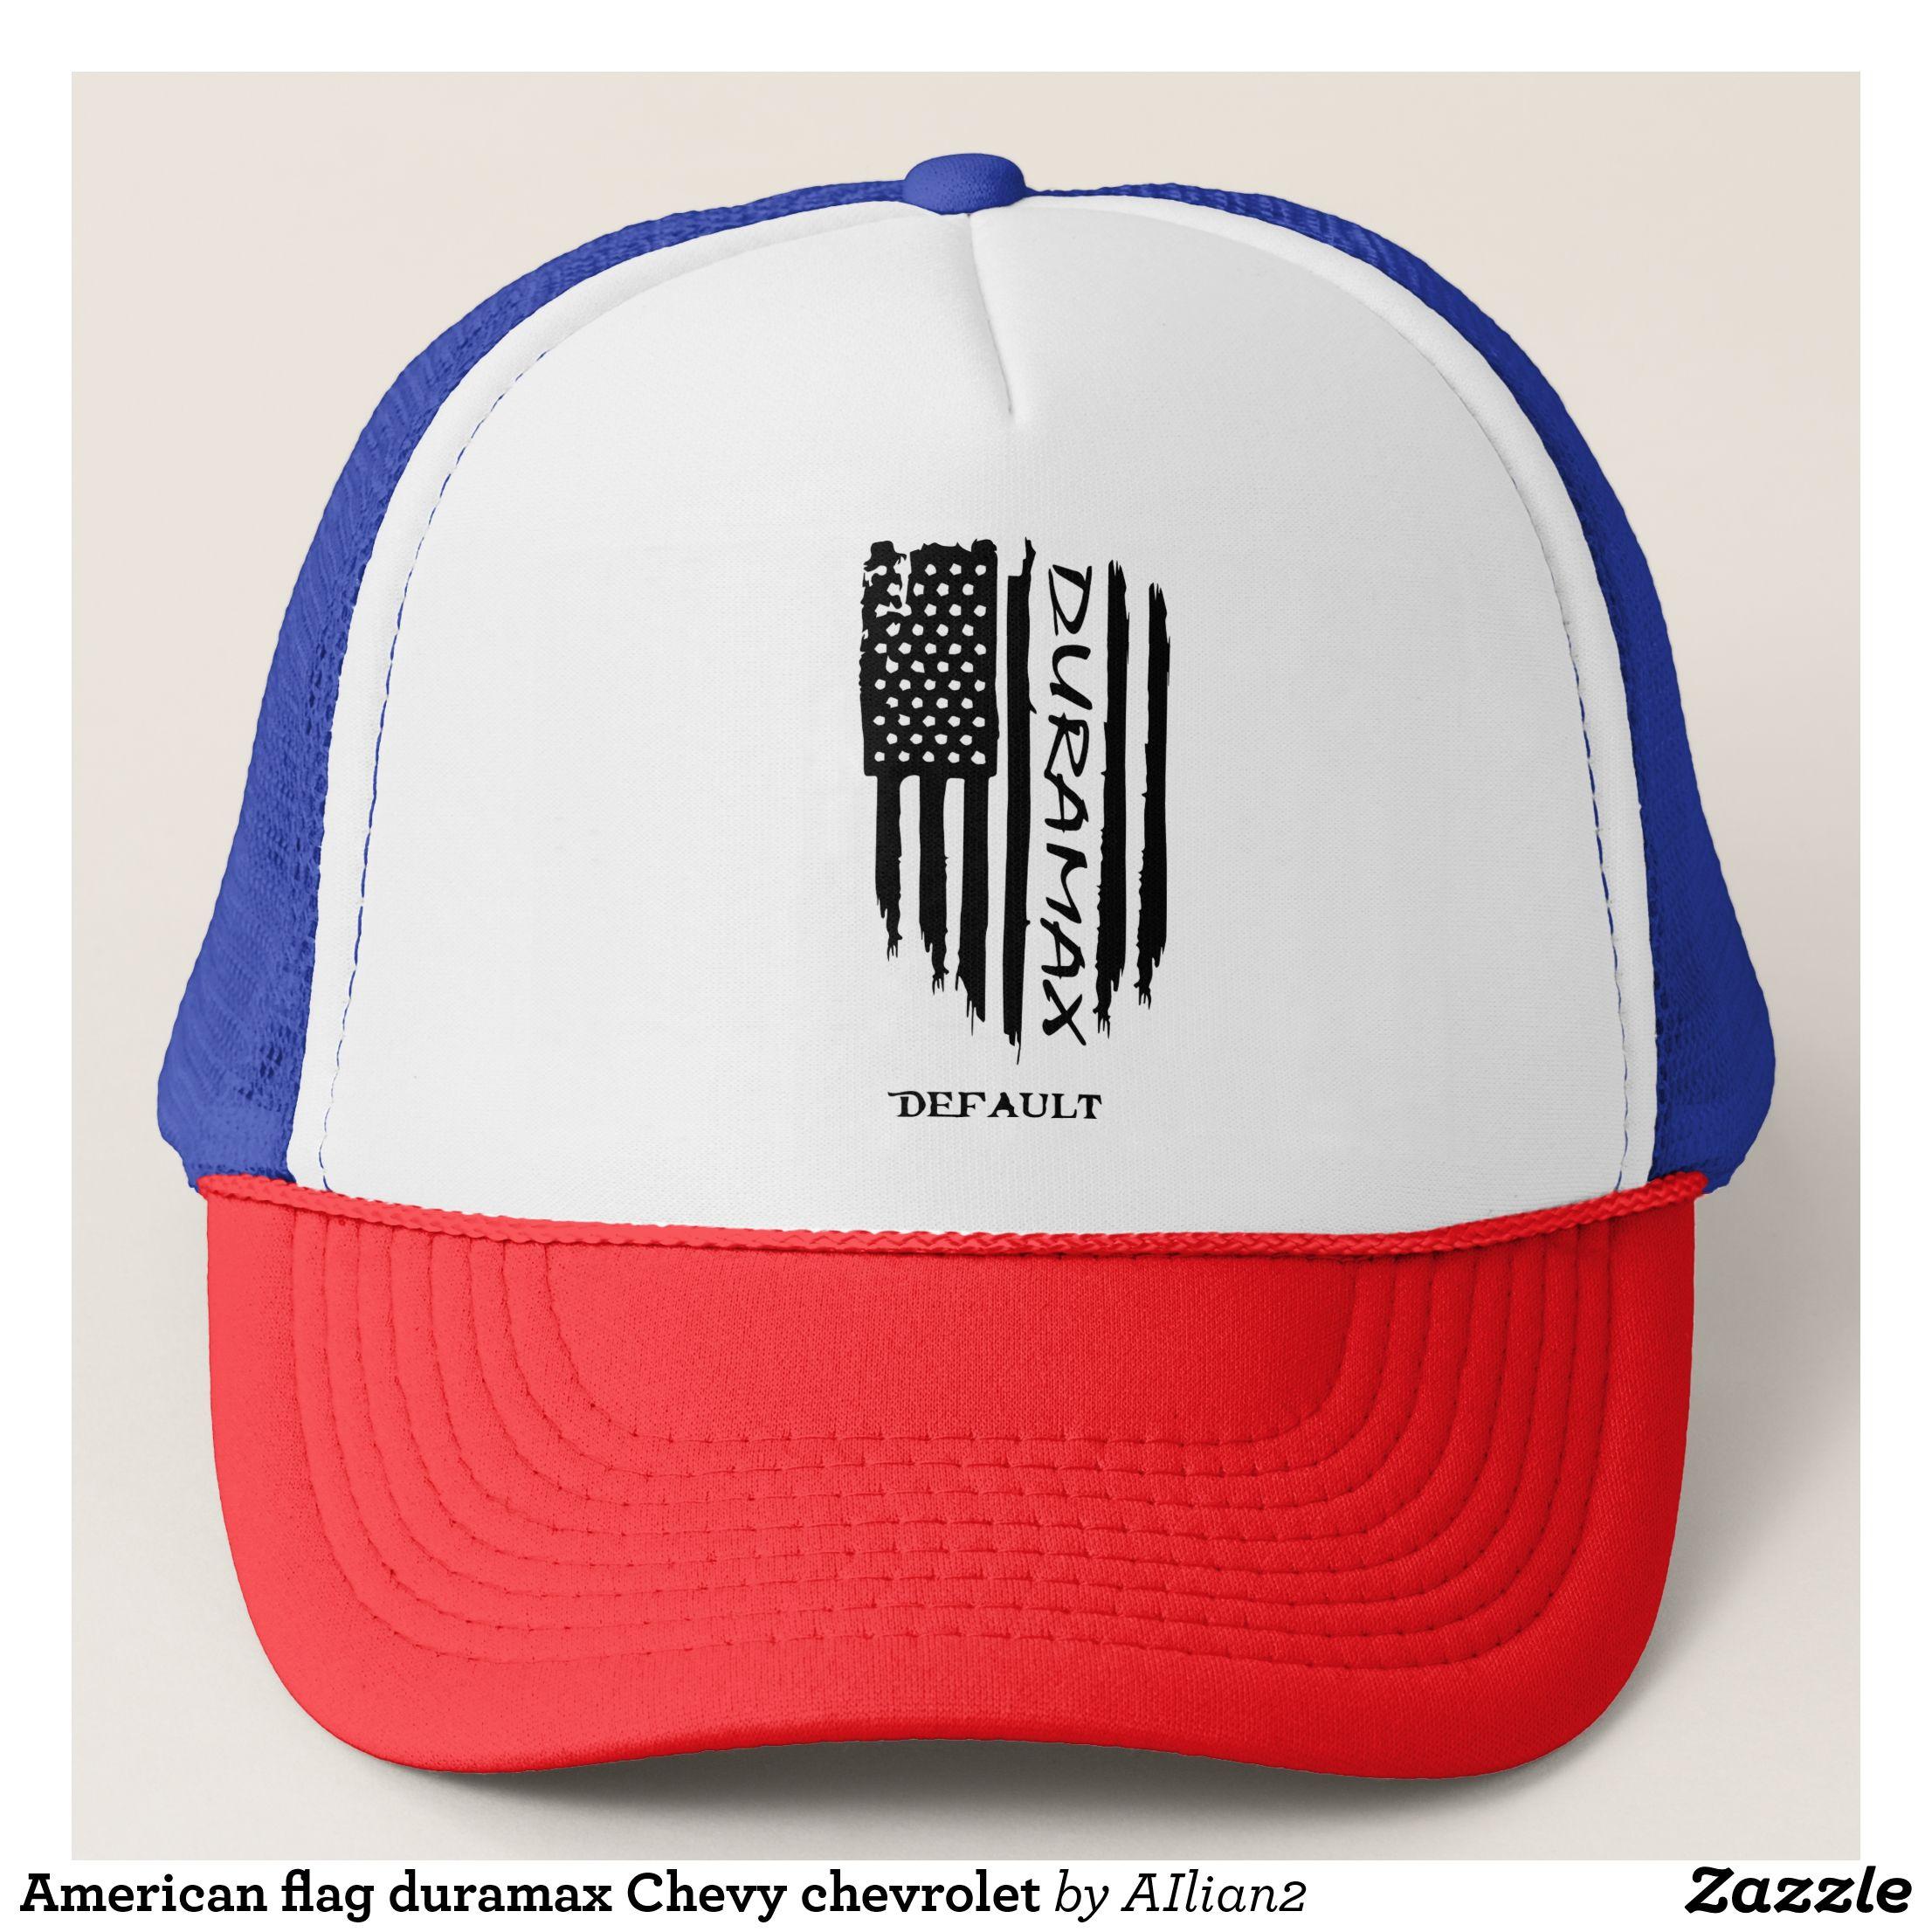 Chevy Duramax Hats Www Topsimages Com